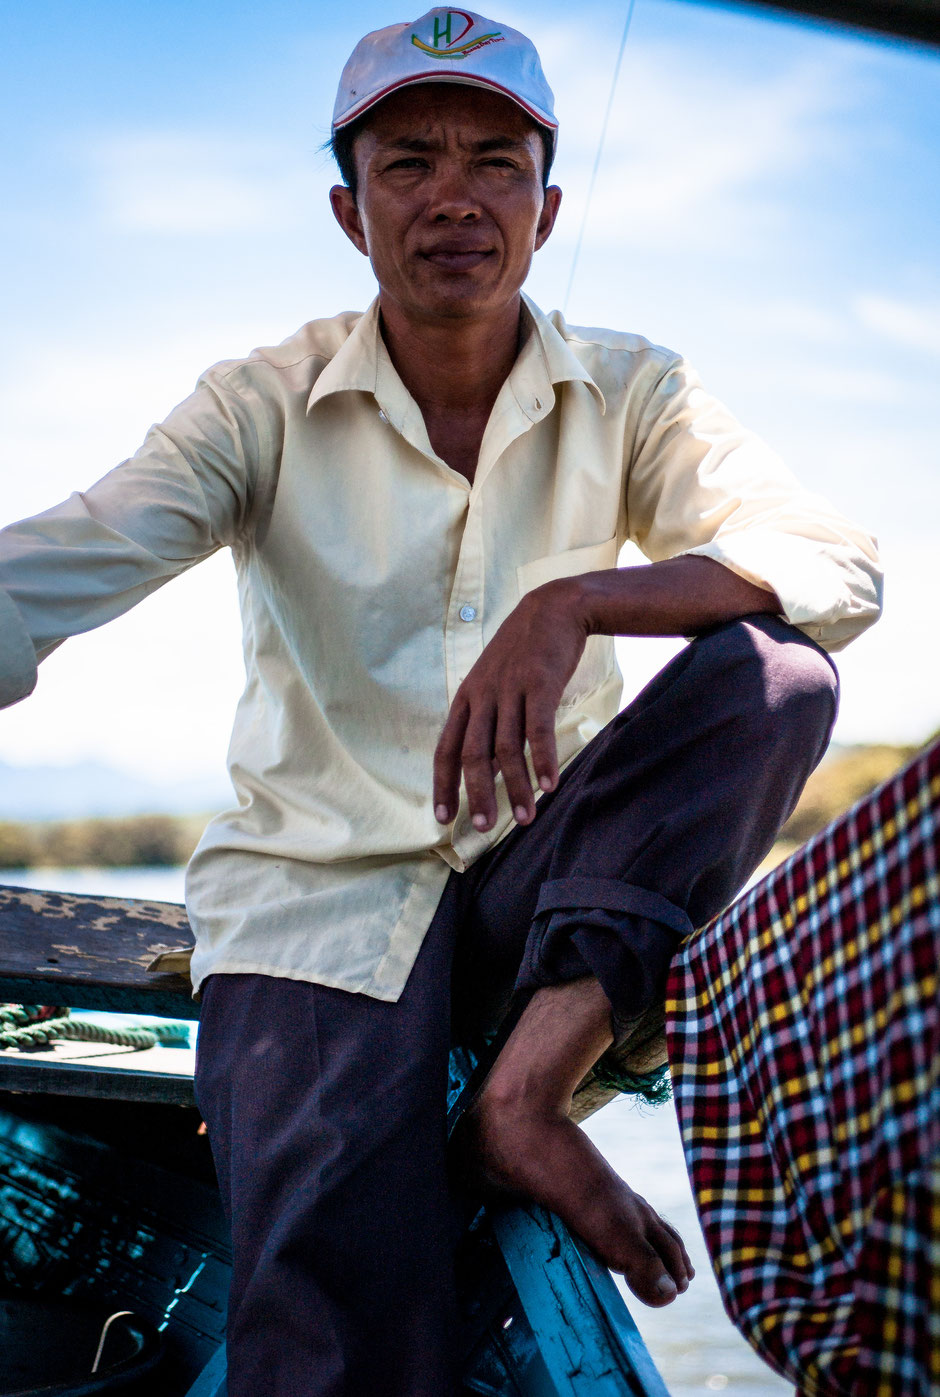 Portrait of the skipper, Mekong River, Vietnam, 2016, 2/2